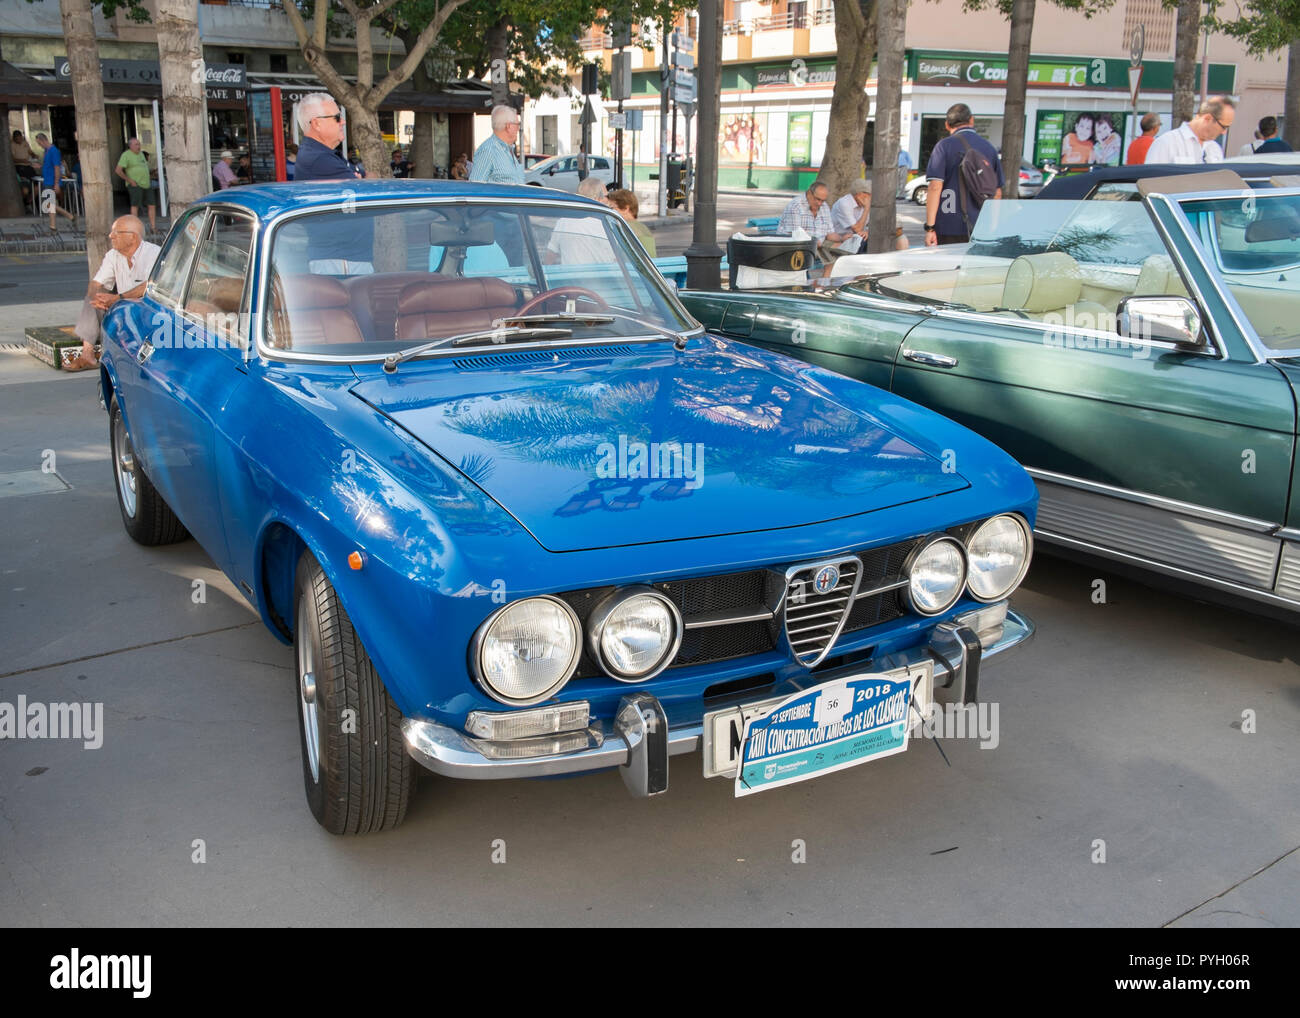 Alfa Romeo 1750 GT Veloce. Reunión de coches clásicos en Torremolinos, Málaga, España. Foto de stock